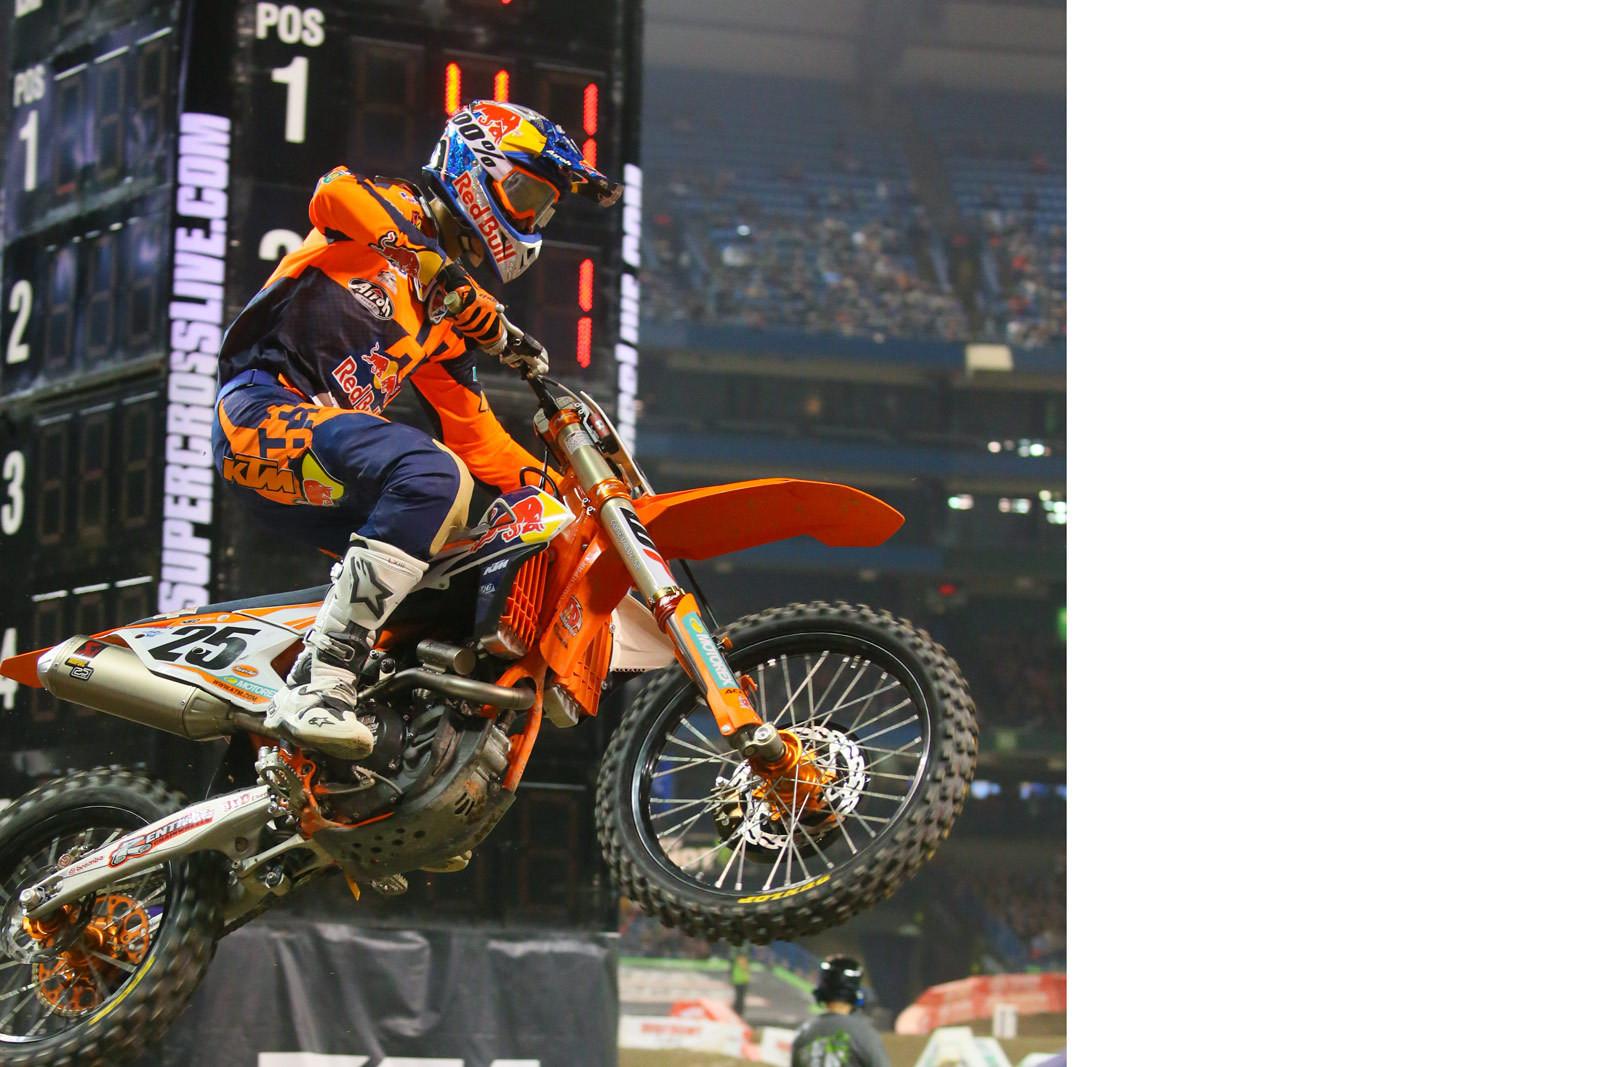 Marvin Musquin - Photo Blast: Toronto - Motocross Pictures - Vital MX